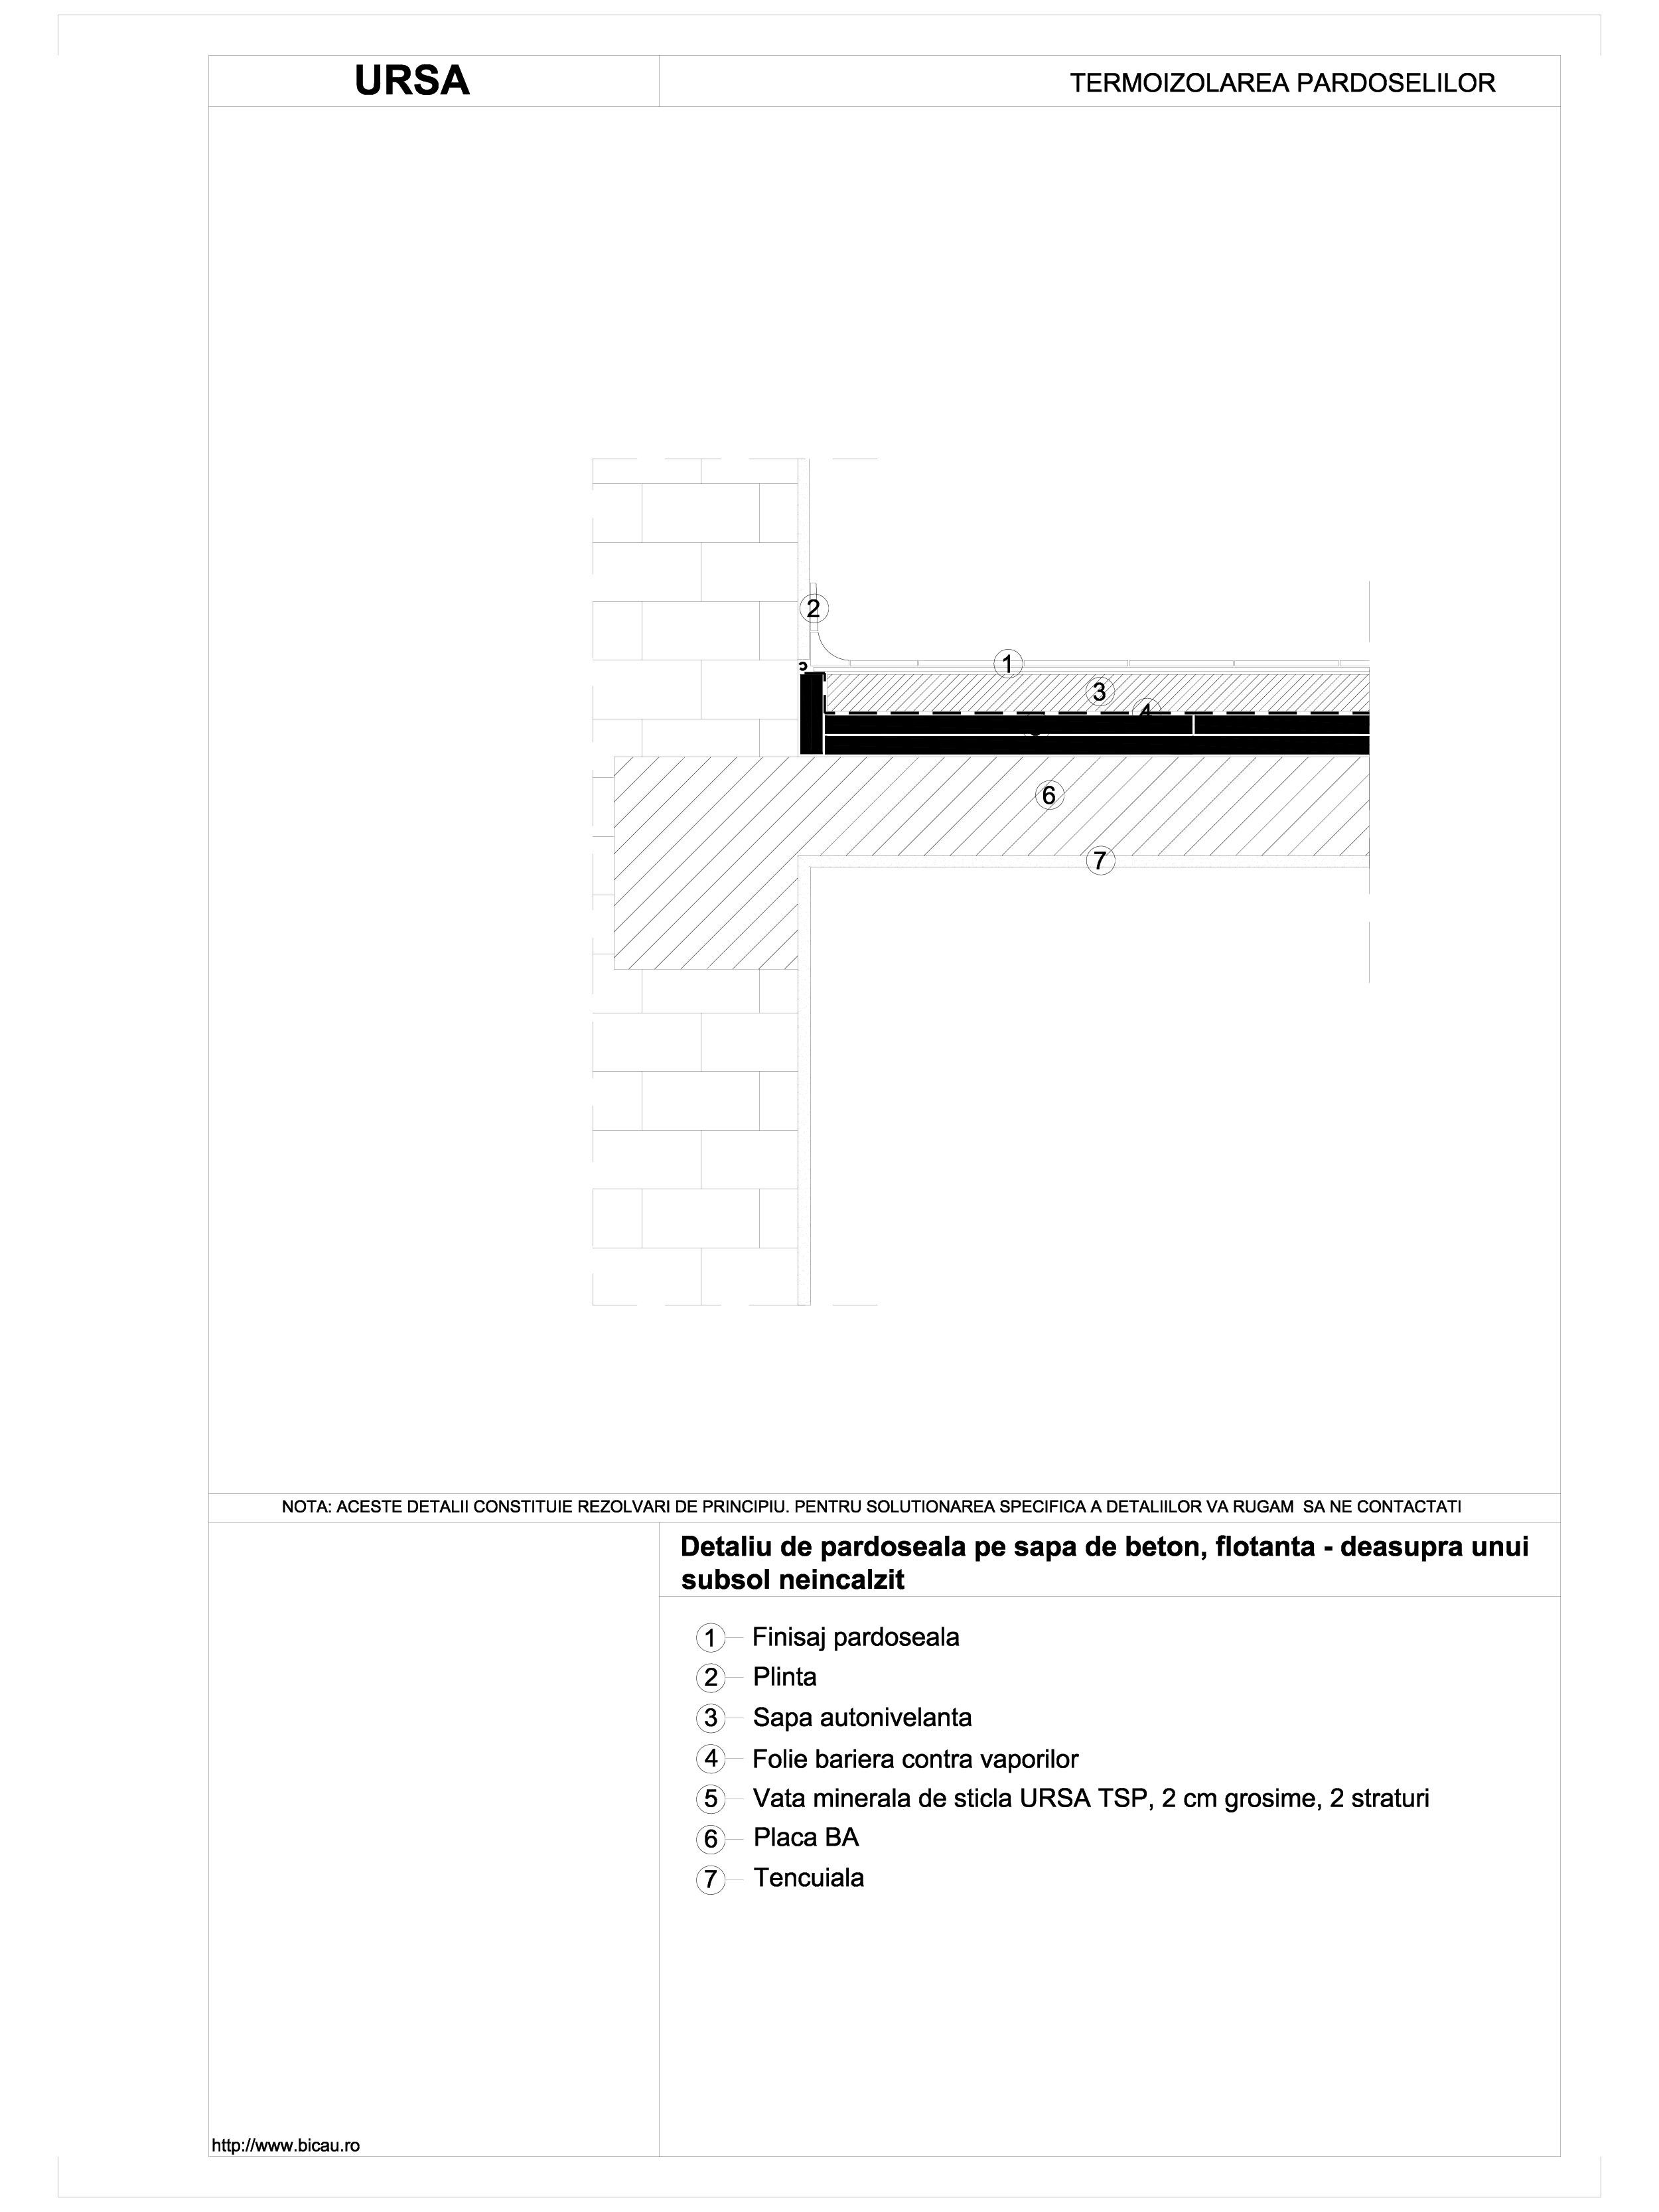 Detaliu de pardoseala pe sapa de beton, flotanta - deasupra unui subsol neincalzit TSP URSA Vata minerala pentru pardoseli URSA ROMANIA   - Pagina 1